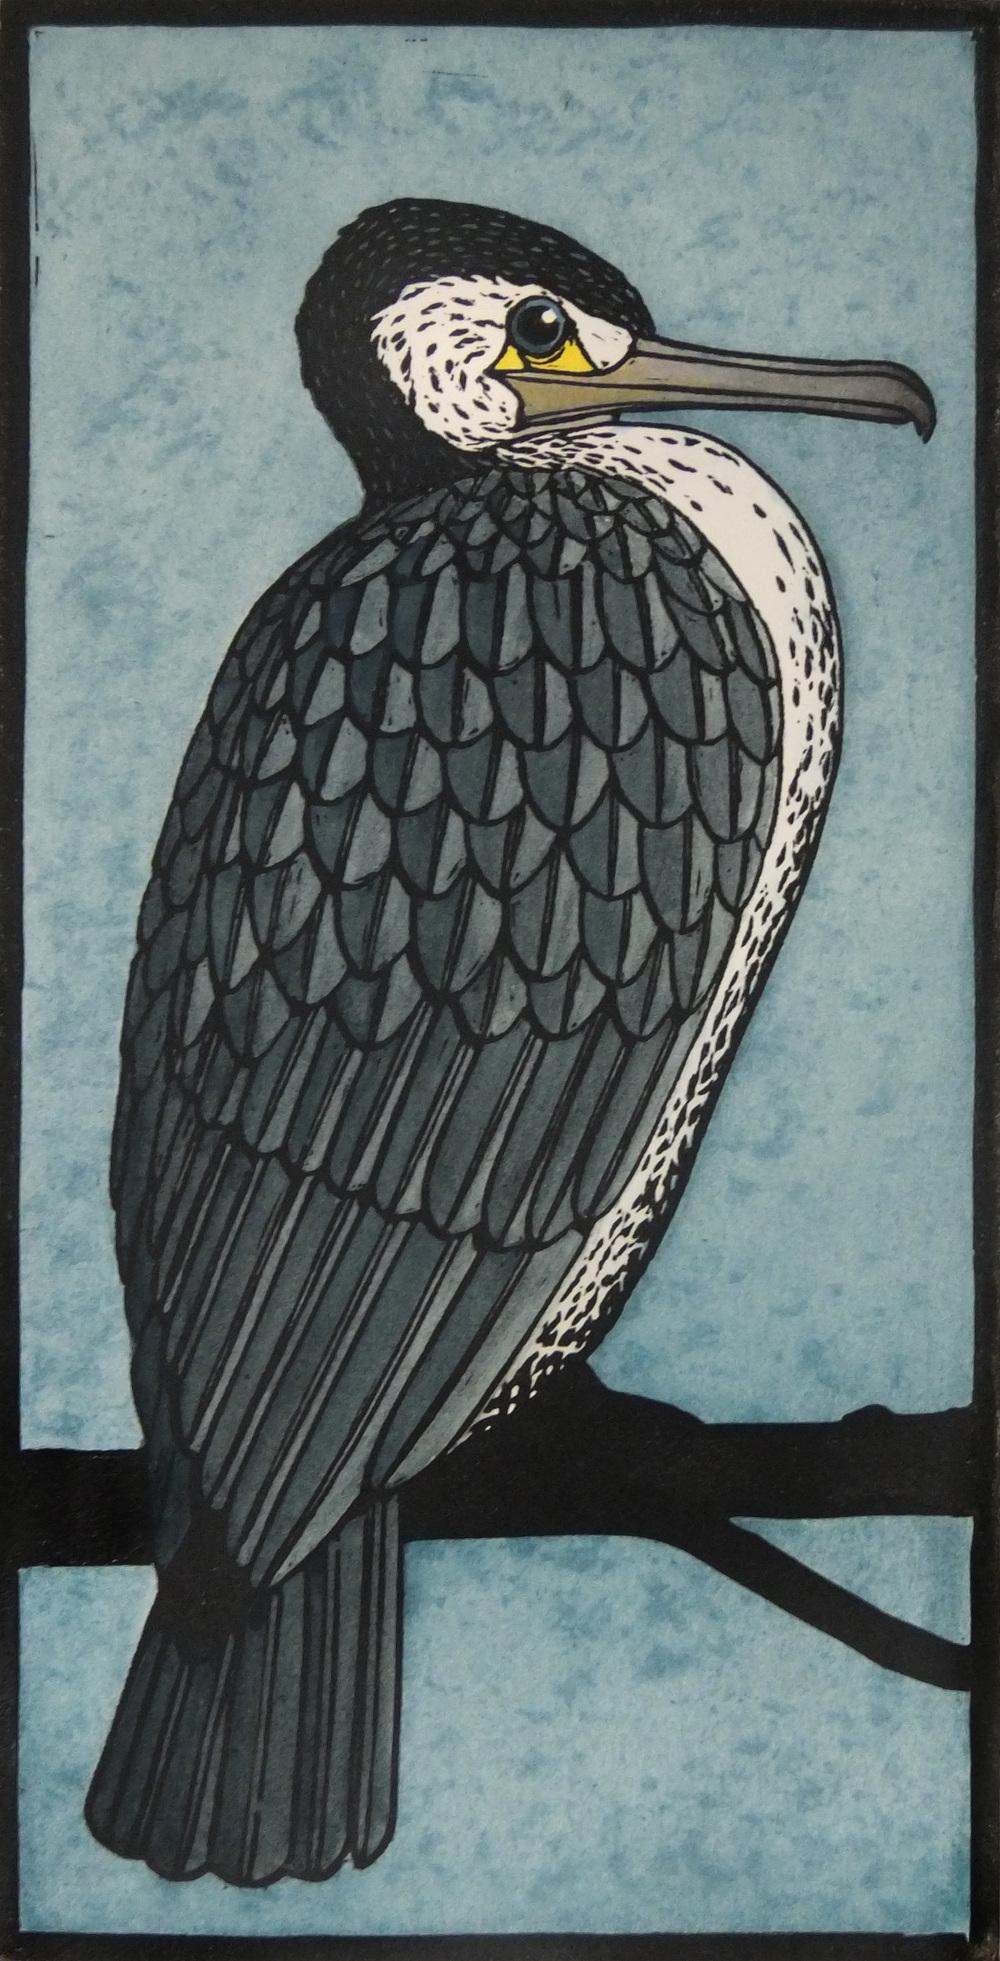 'The Cormorant'